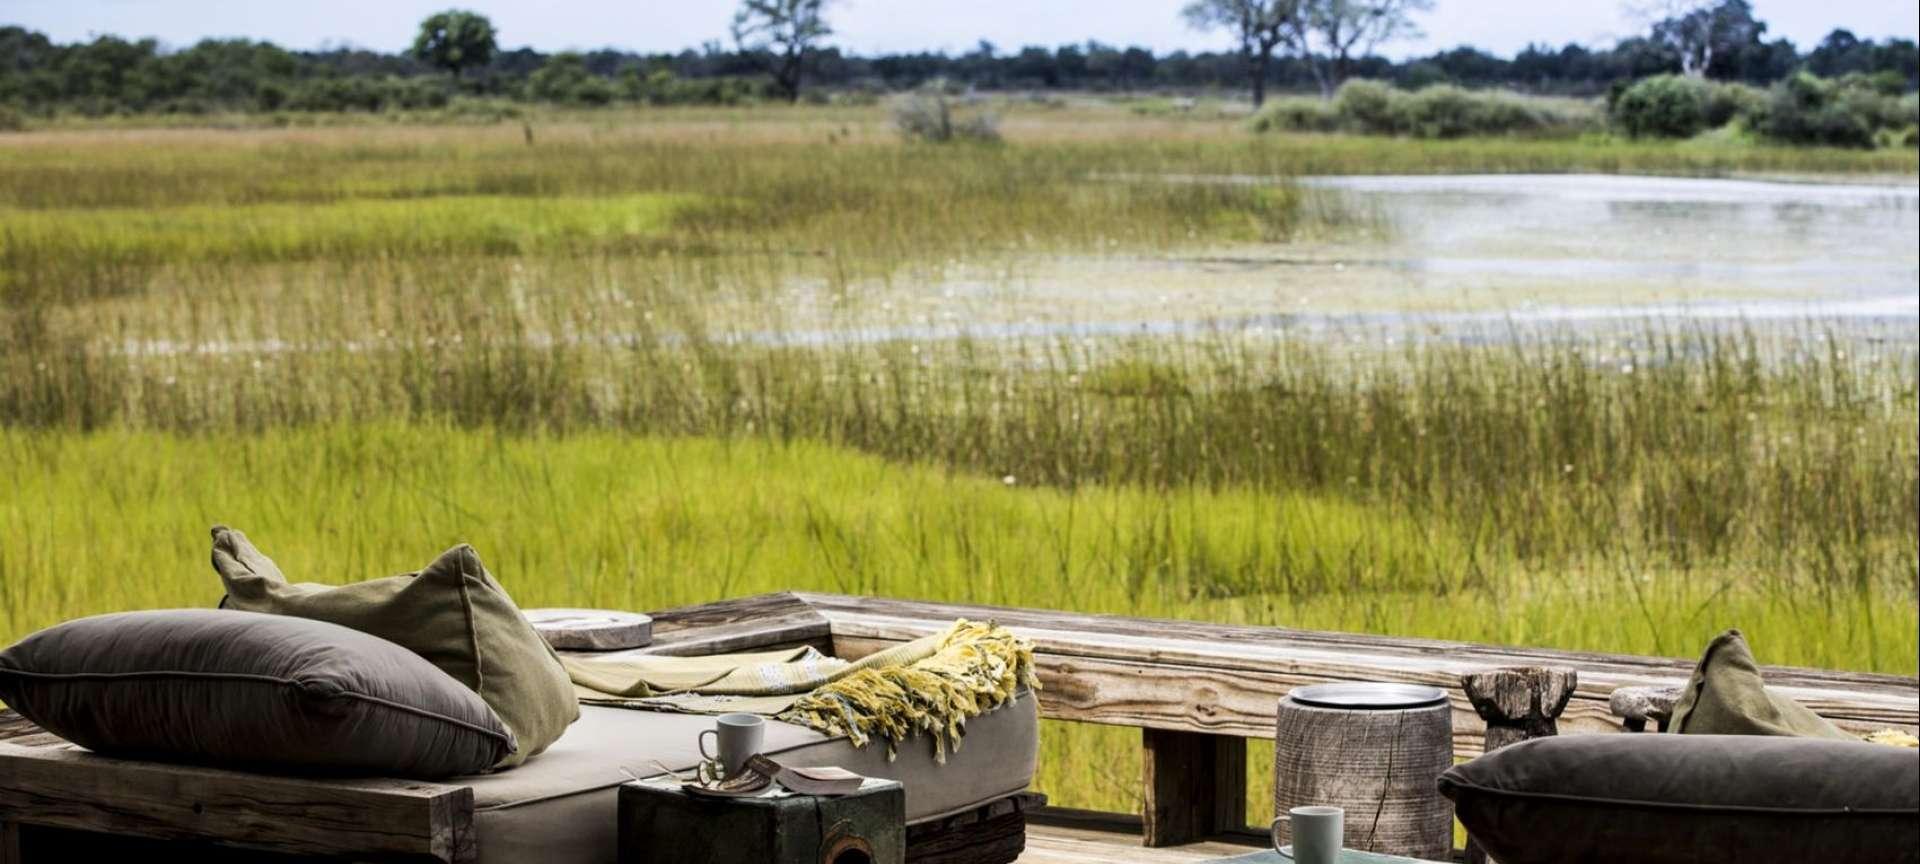 Luxury safaris in Botswana - Africa Wildlife Safaris